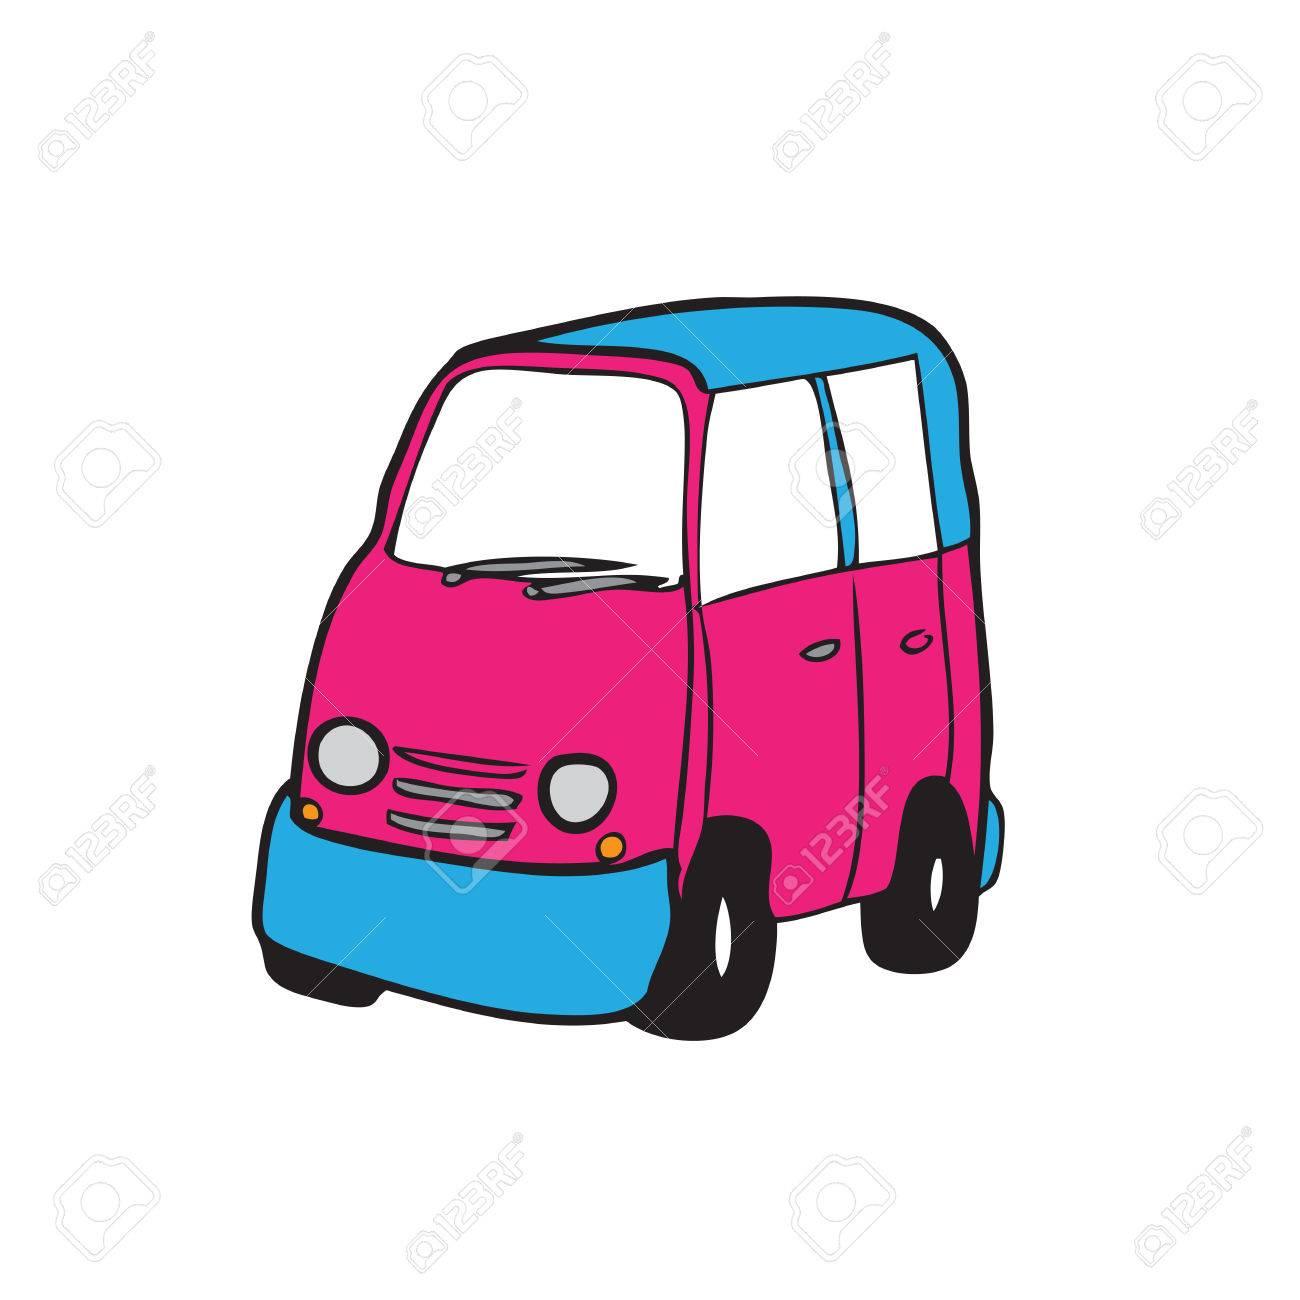 1300x1300 Minivan Cartoon Vector Drawing Pink Royalty Free Cliparts, Vectors